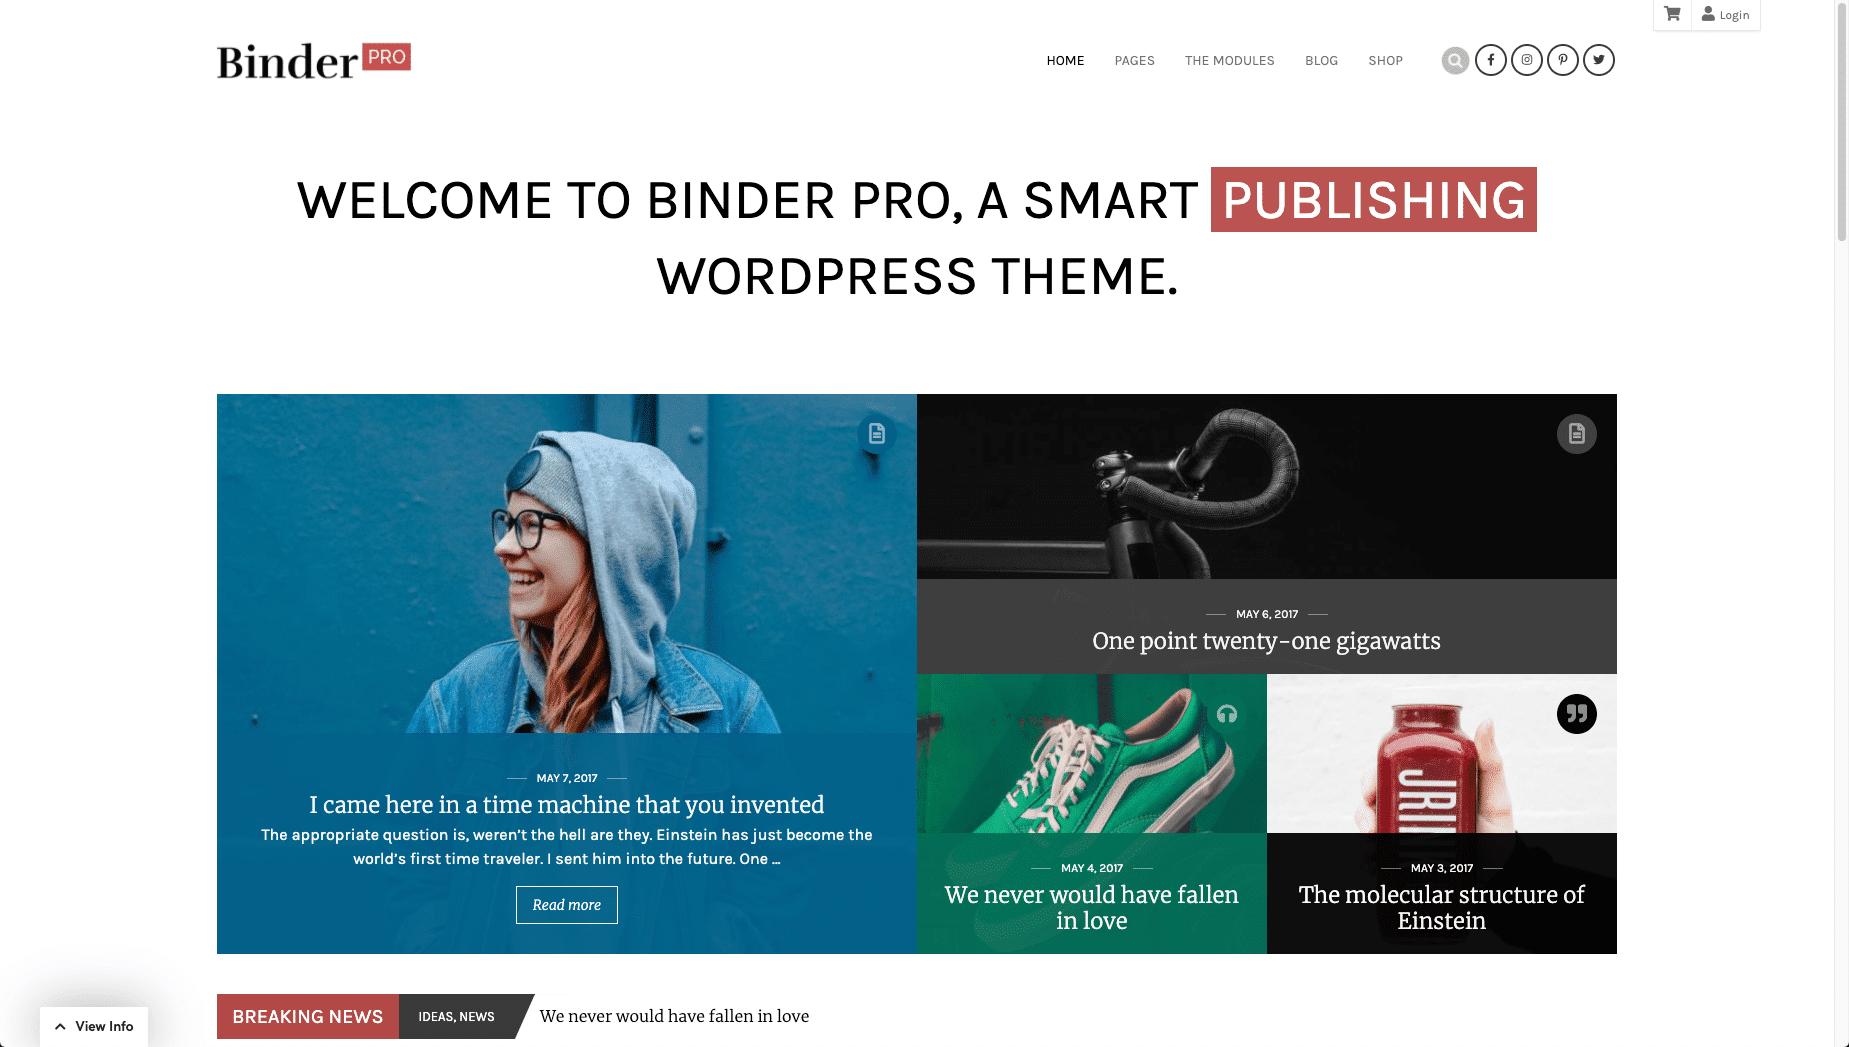 binder pro - WordPress membership theme